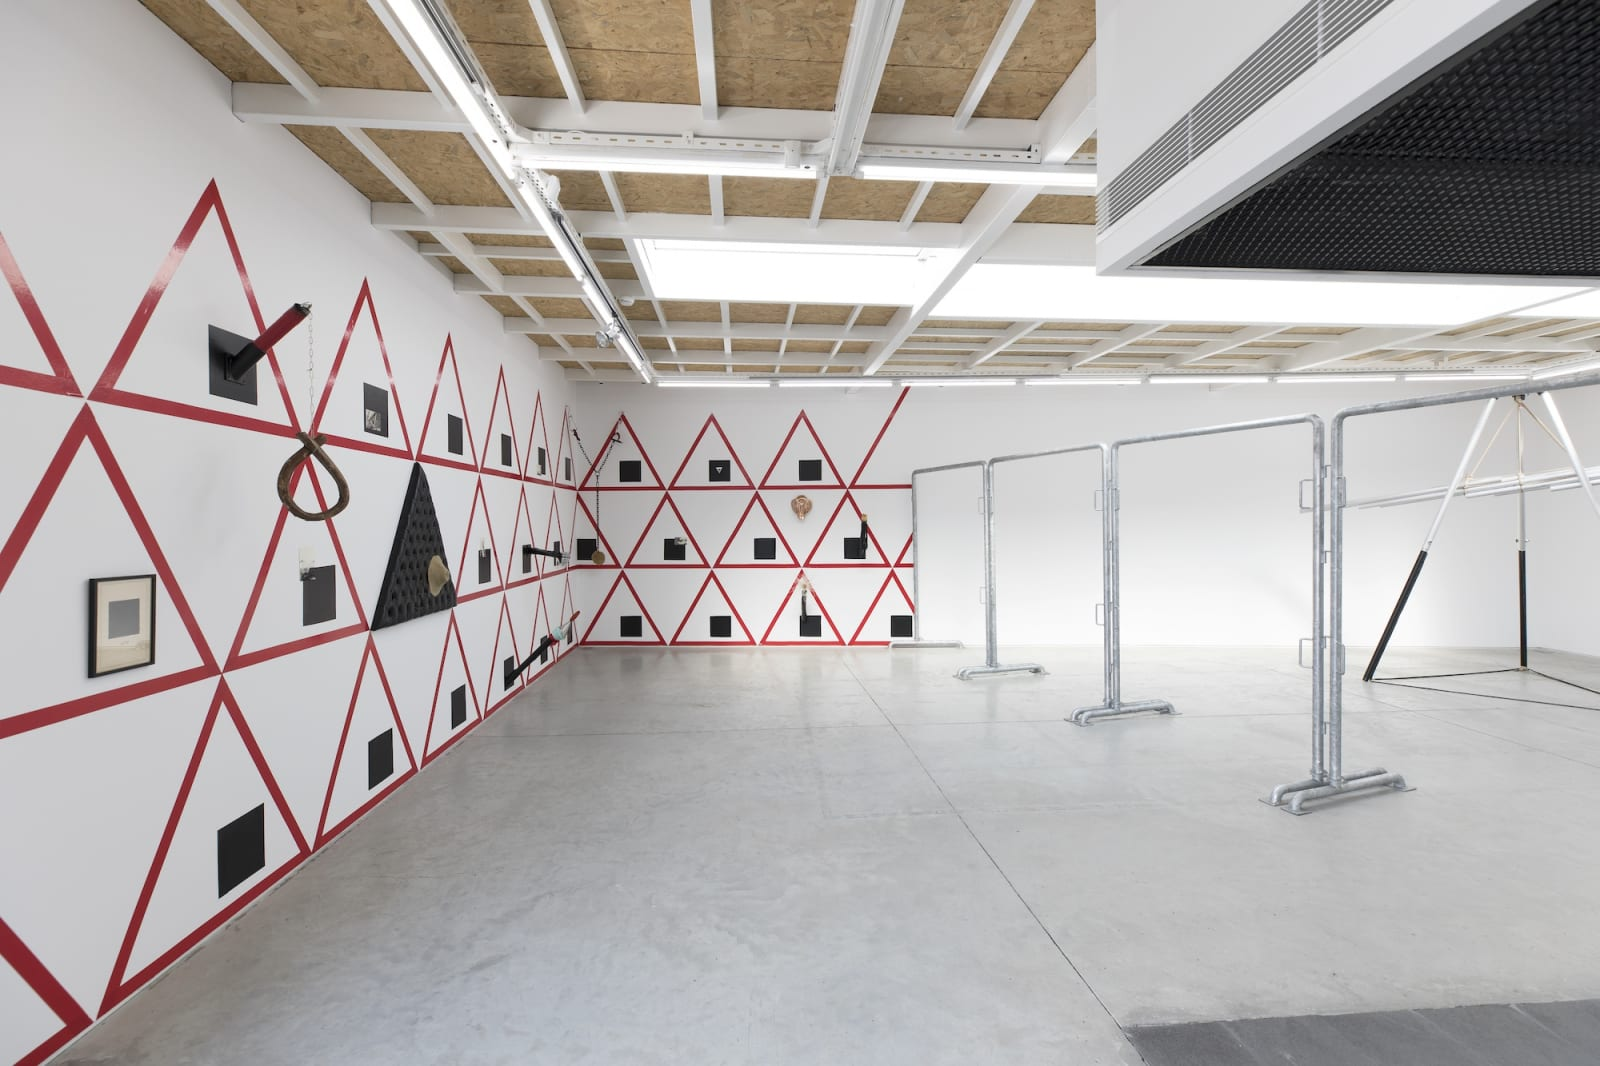 İz Öztat Installation view 2019